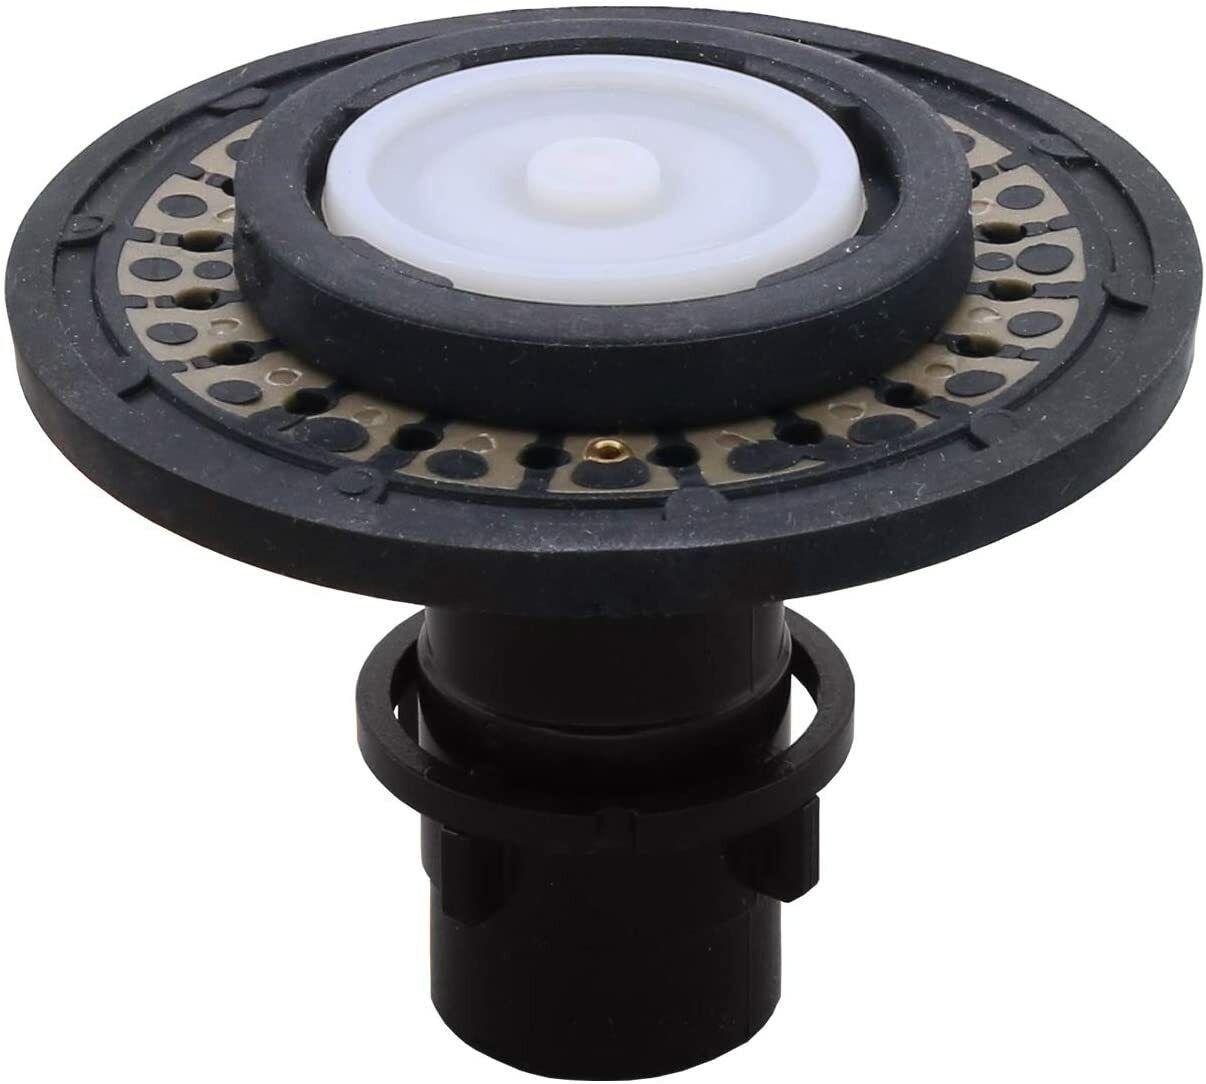 FlushLine Replacement Sloan 3301036 A-36-A 4.5 GPF Closet Drop-In Repair Kit Home & Garden